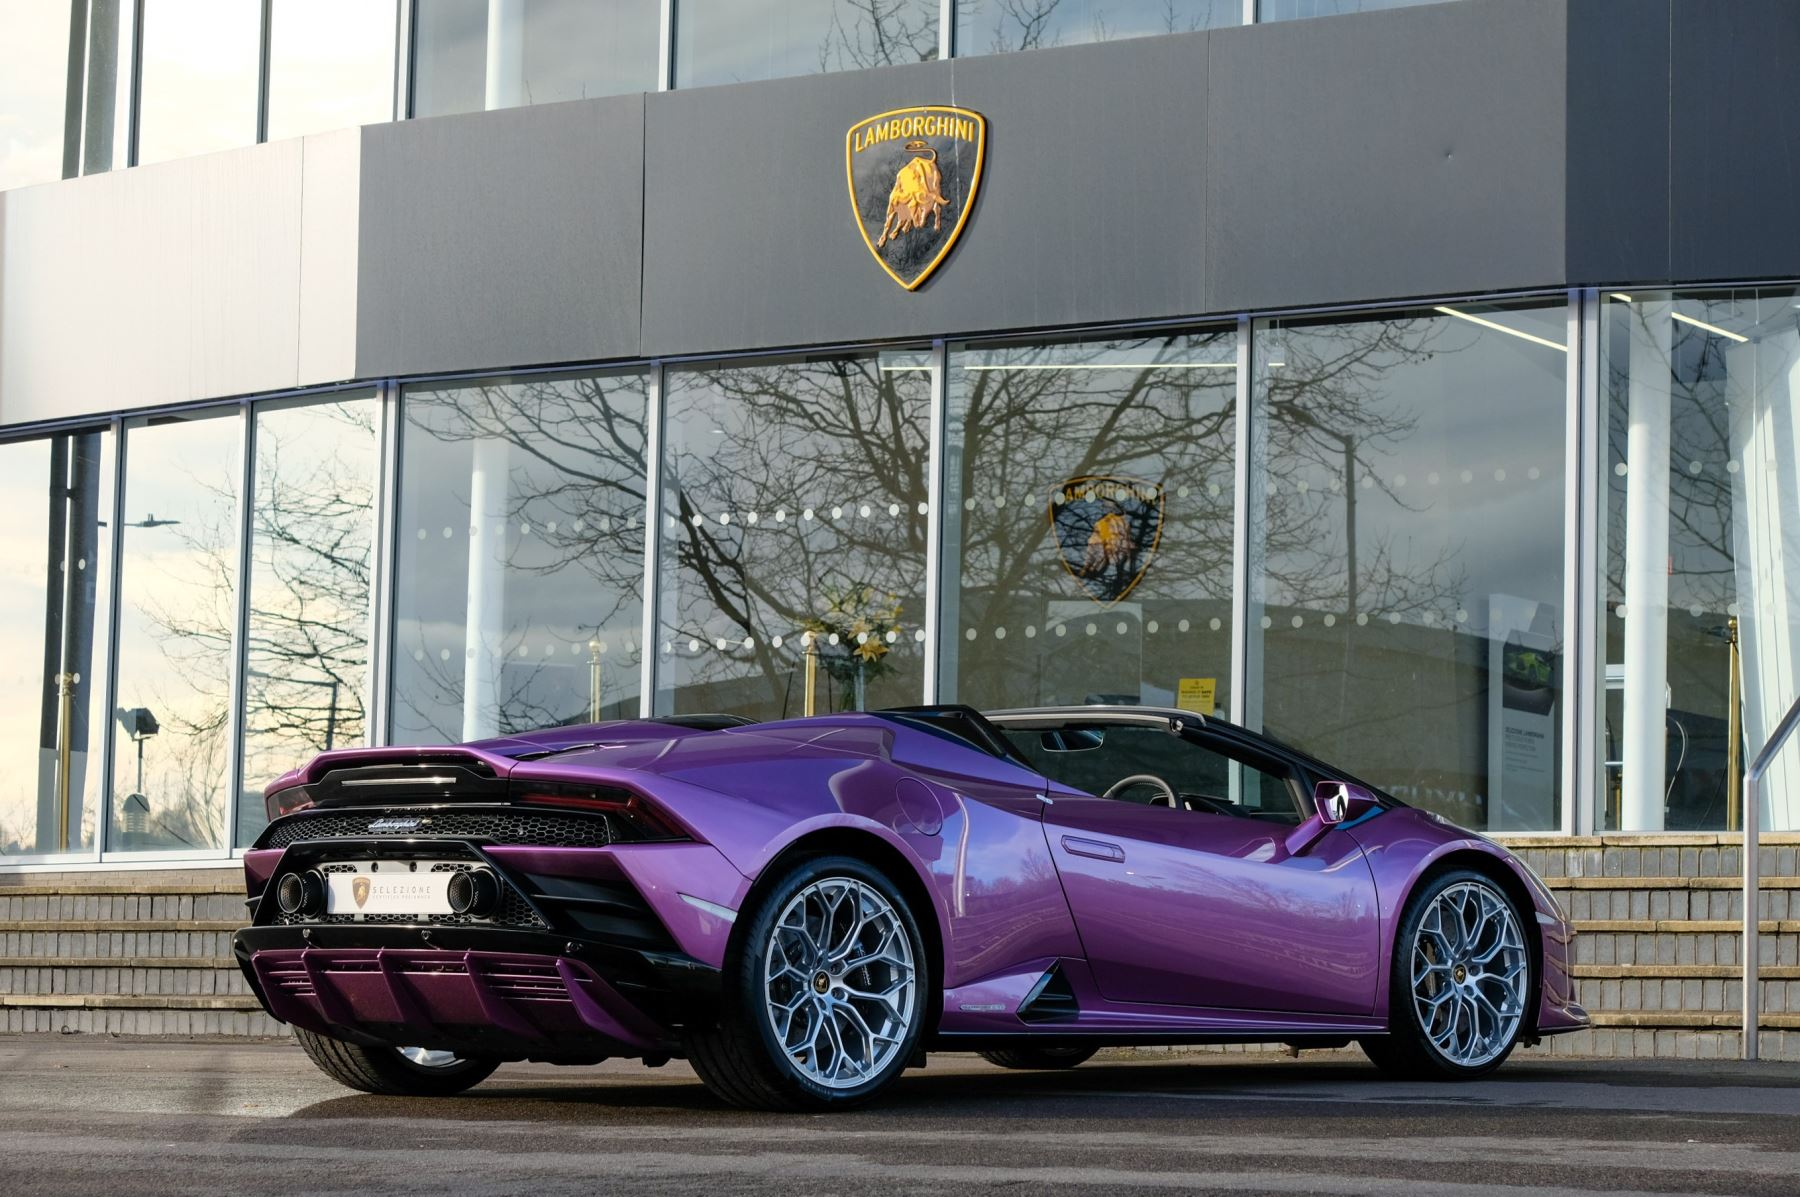 Lamborghini Huracan EVO Spyder 5.2 V10 640 2dr Auto AWD image 27